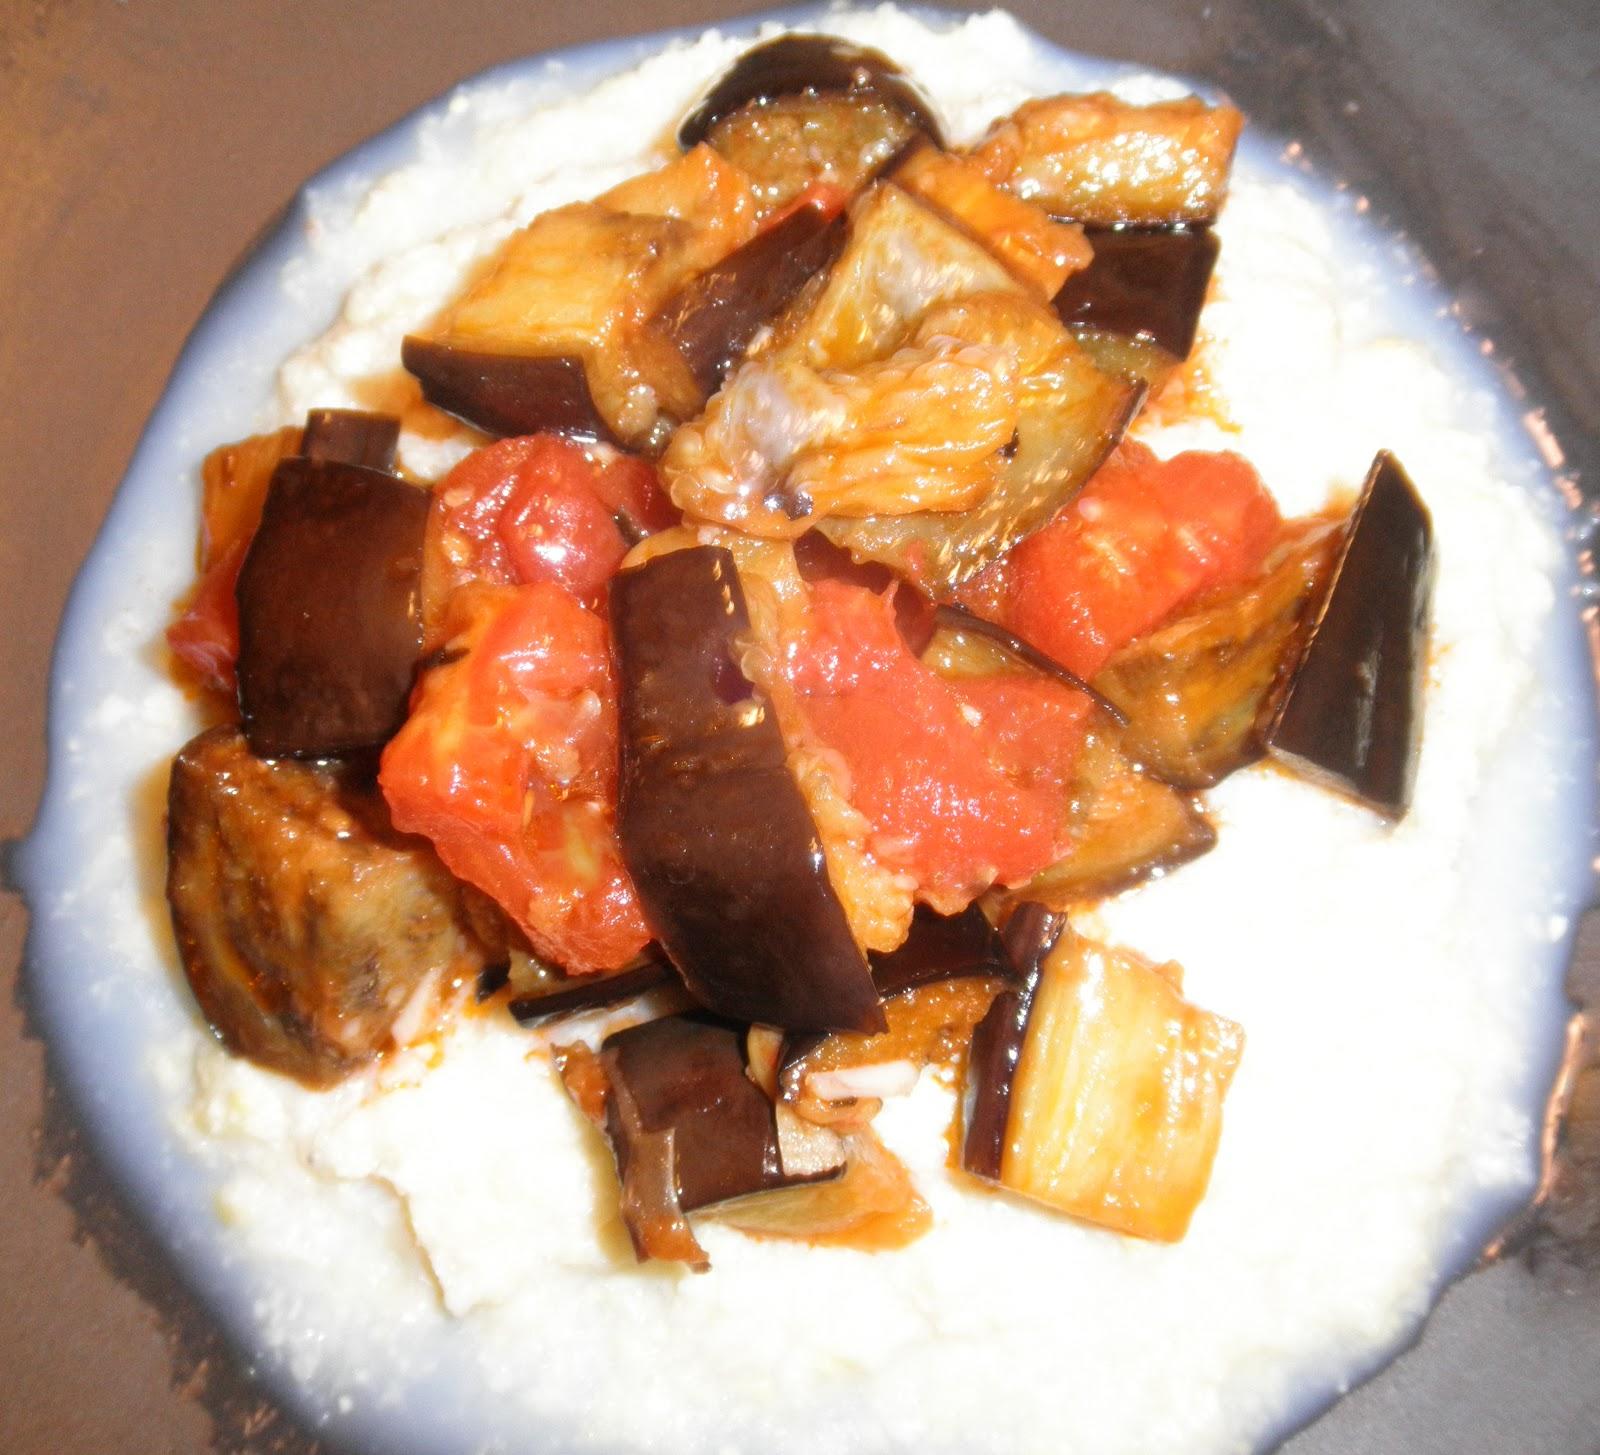 ... Heer's Culinary Corner: SWEET CORN POLENTA WITH EGGPLANT AND TOMATOES